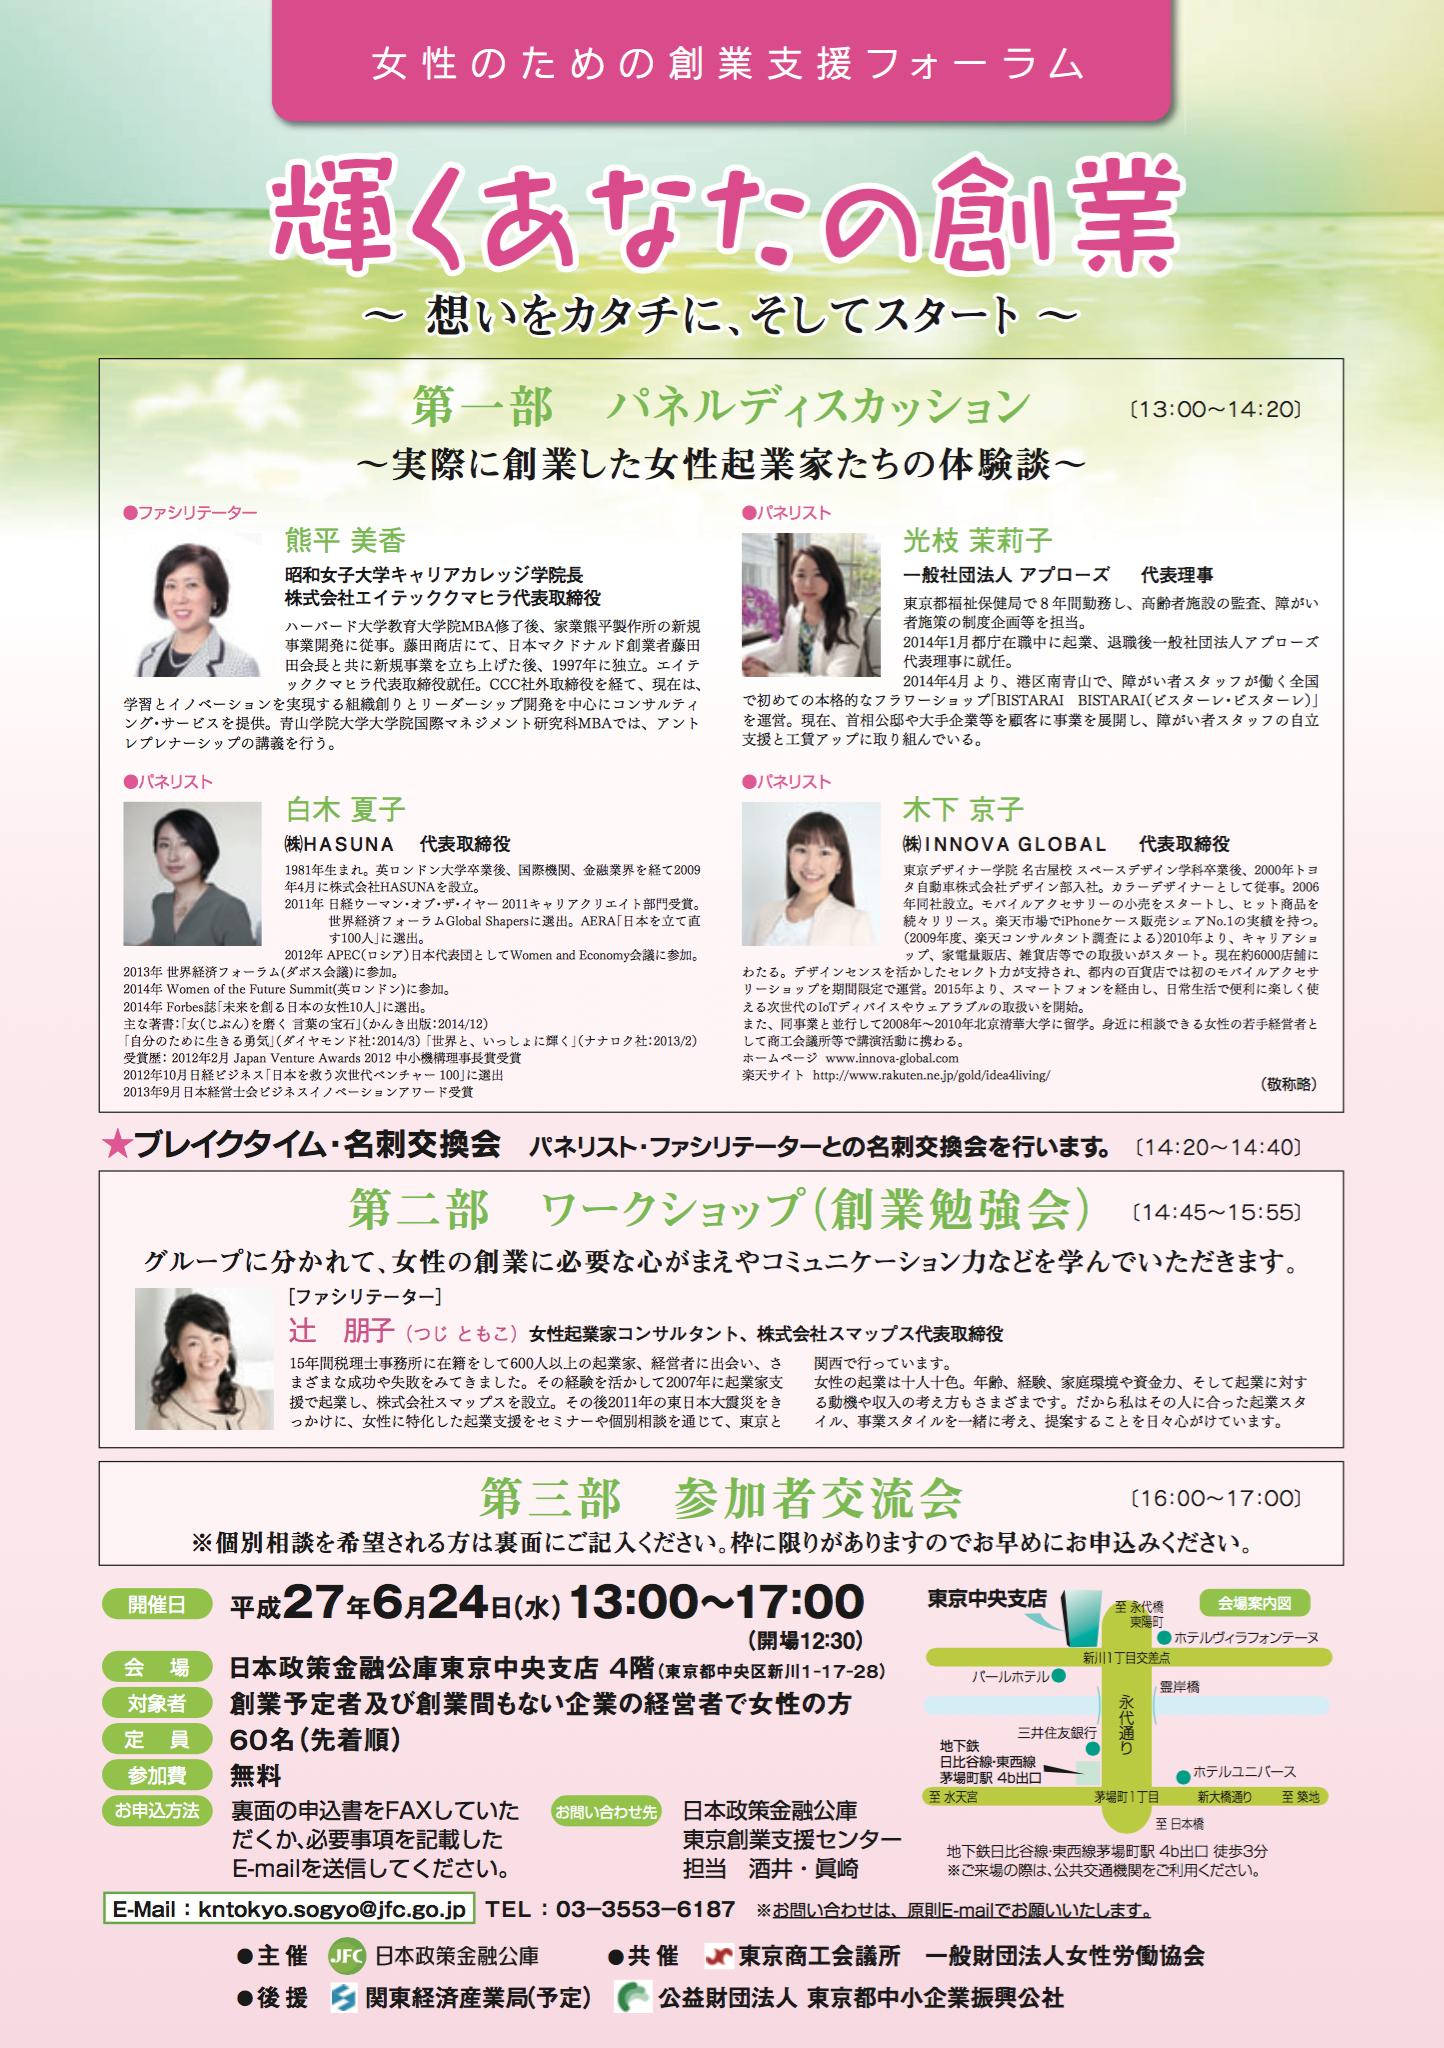 日本政策金融公庫 国民生活事業 @創業支援フォーラム